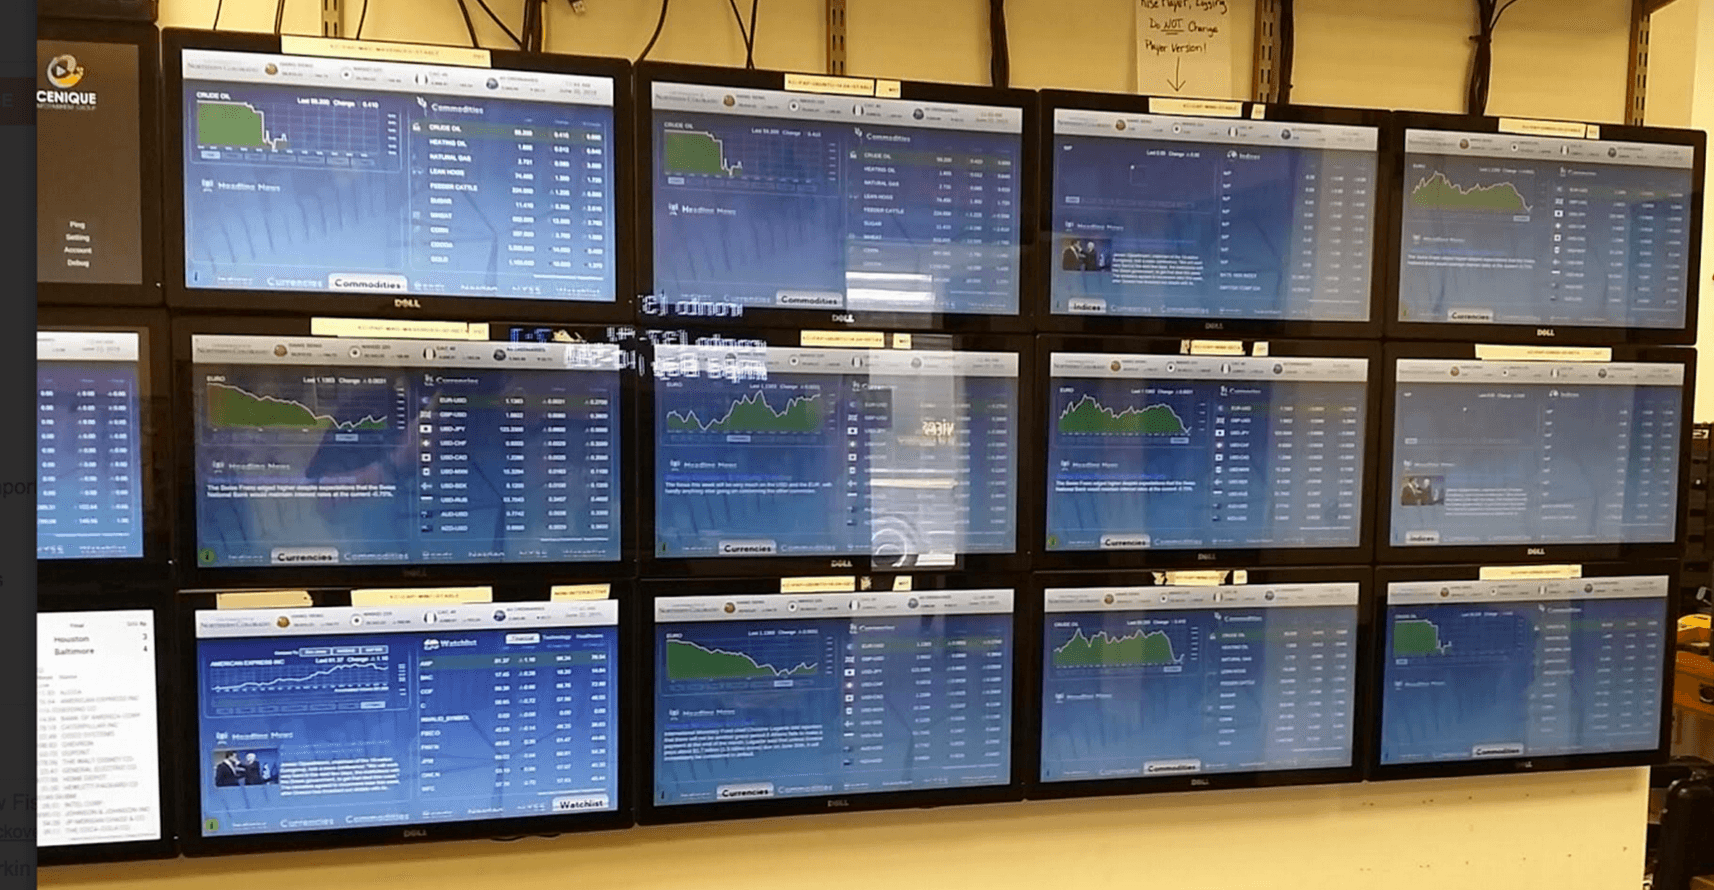 testing uptime wall